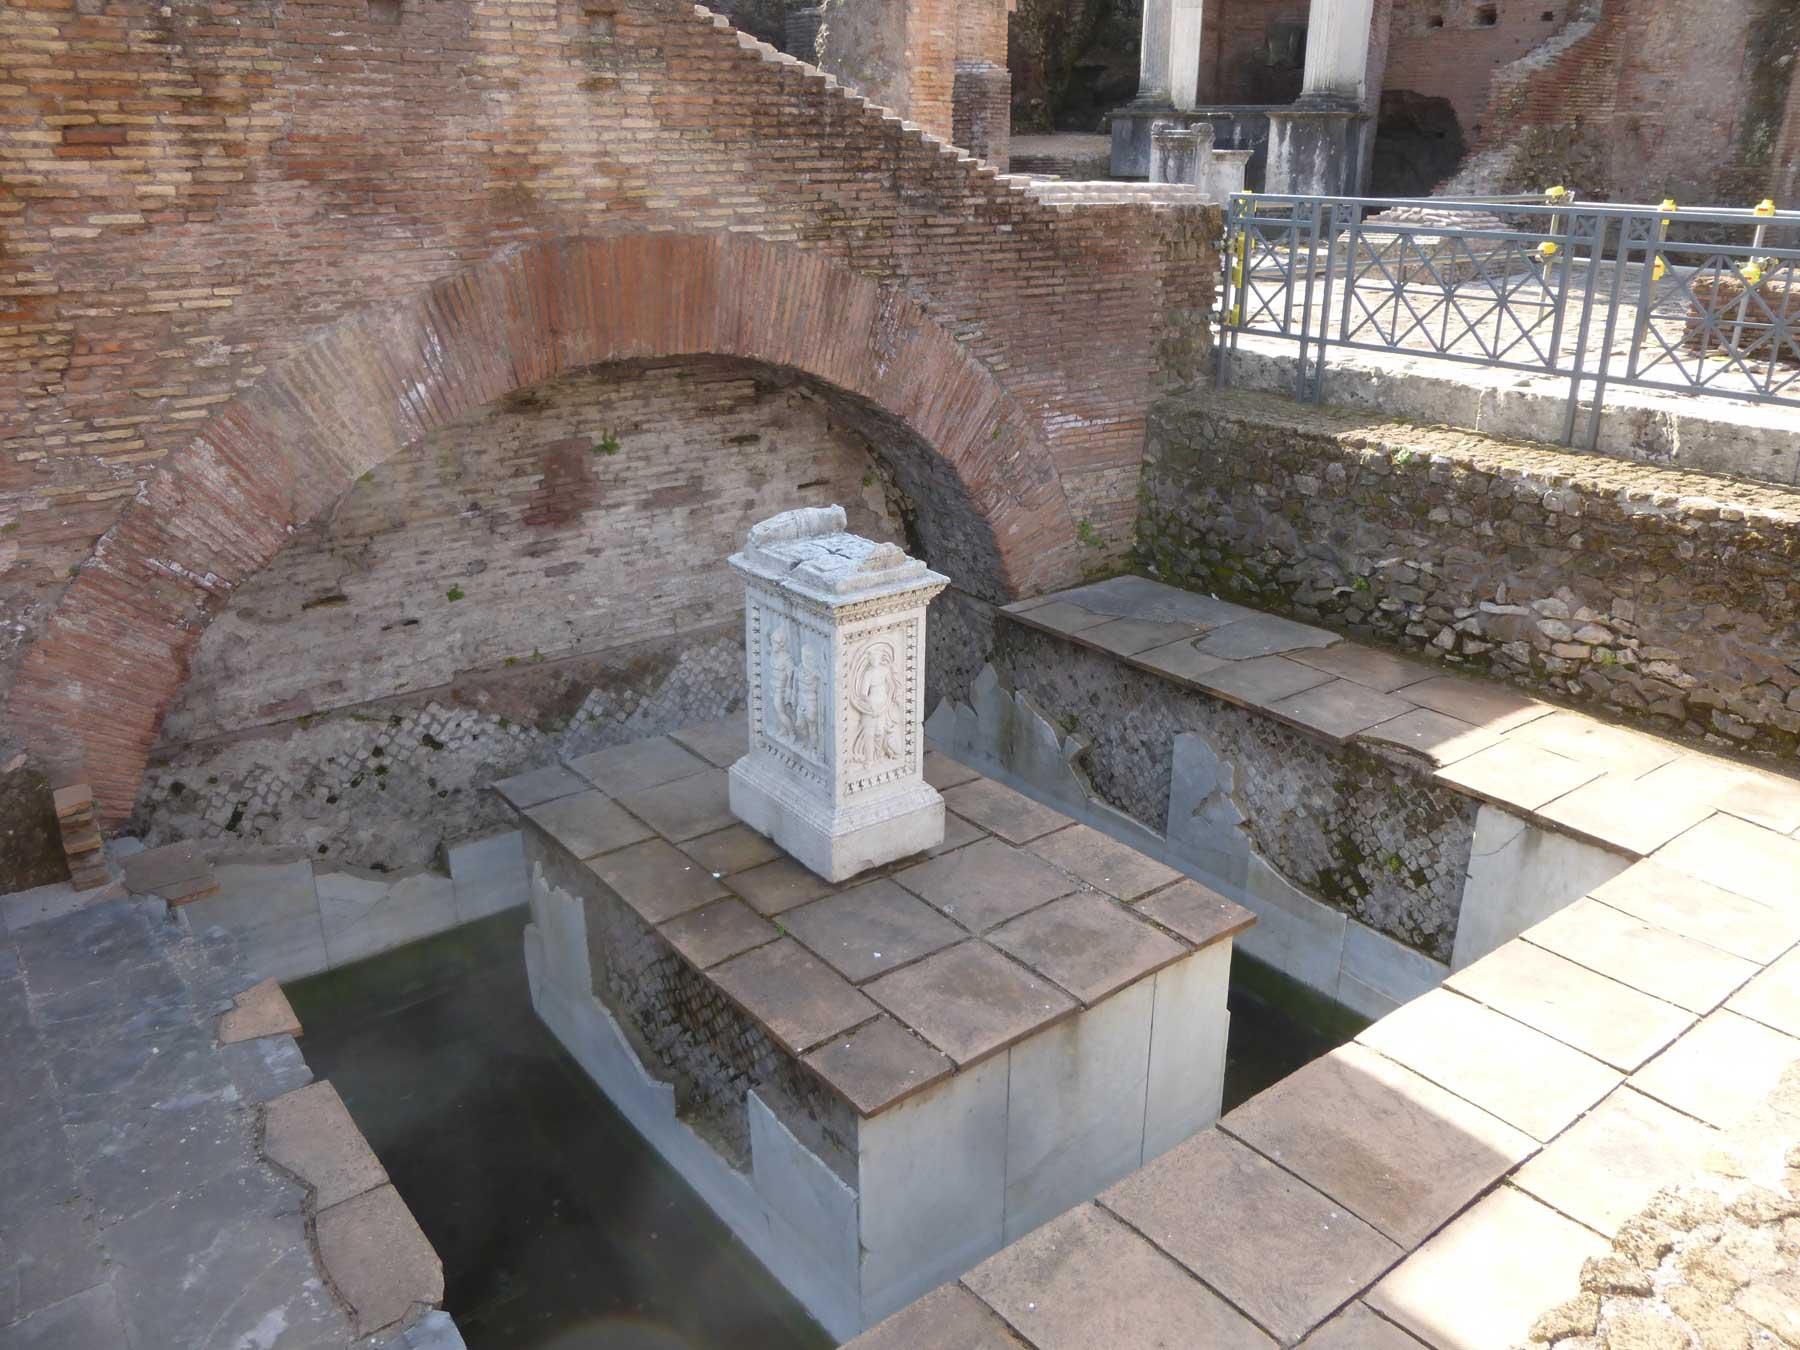 Pool of Juturna in Rome